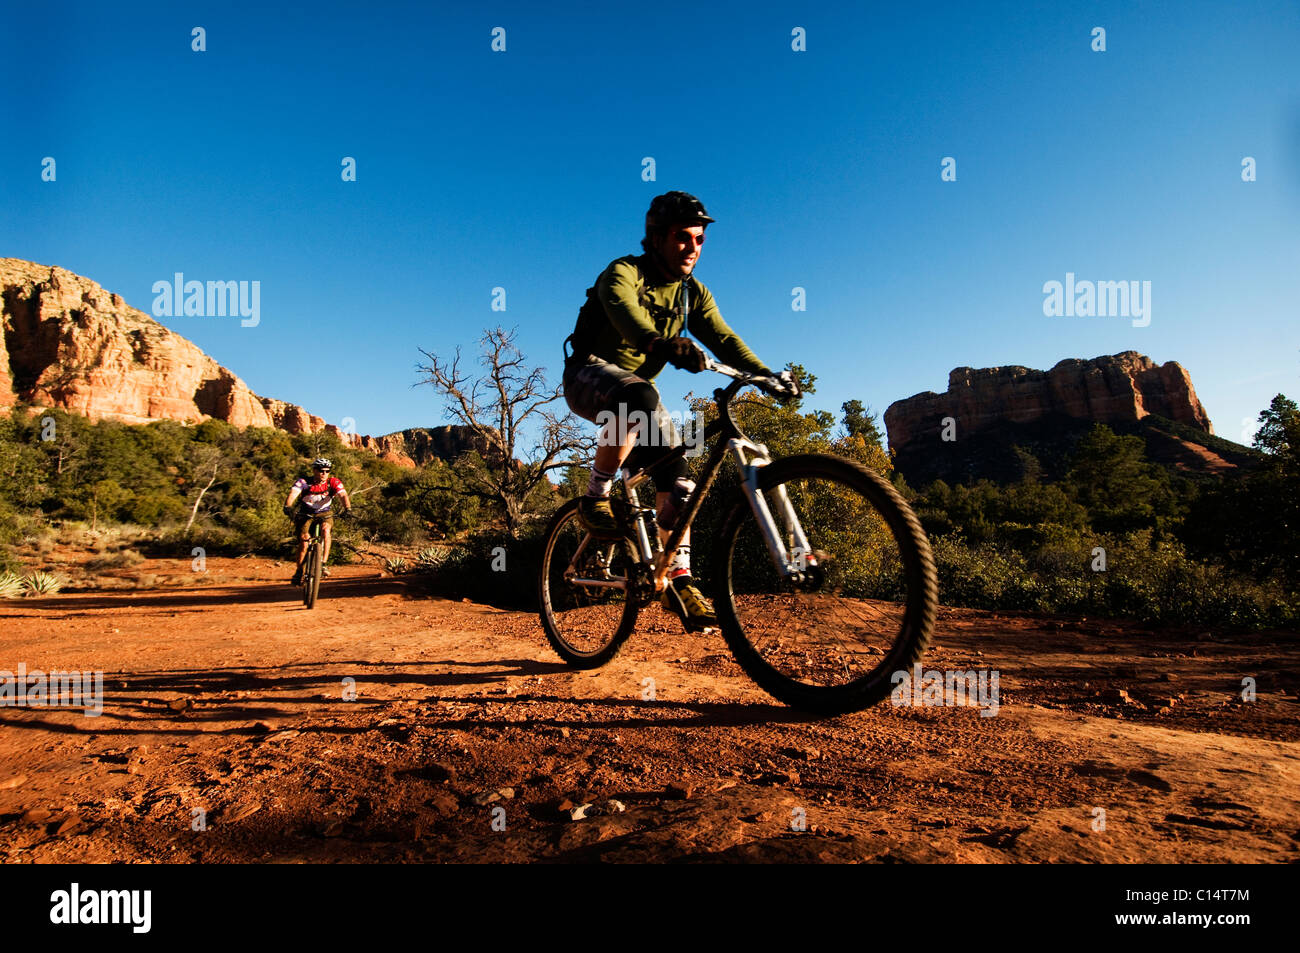 Two middle age men ride mountain bikes through the red rock country of Sedona, AZ. - Stock Image